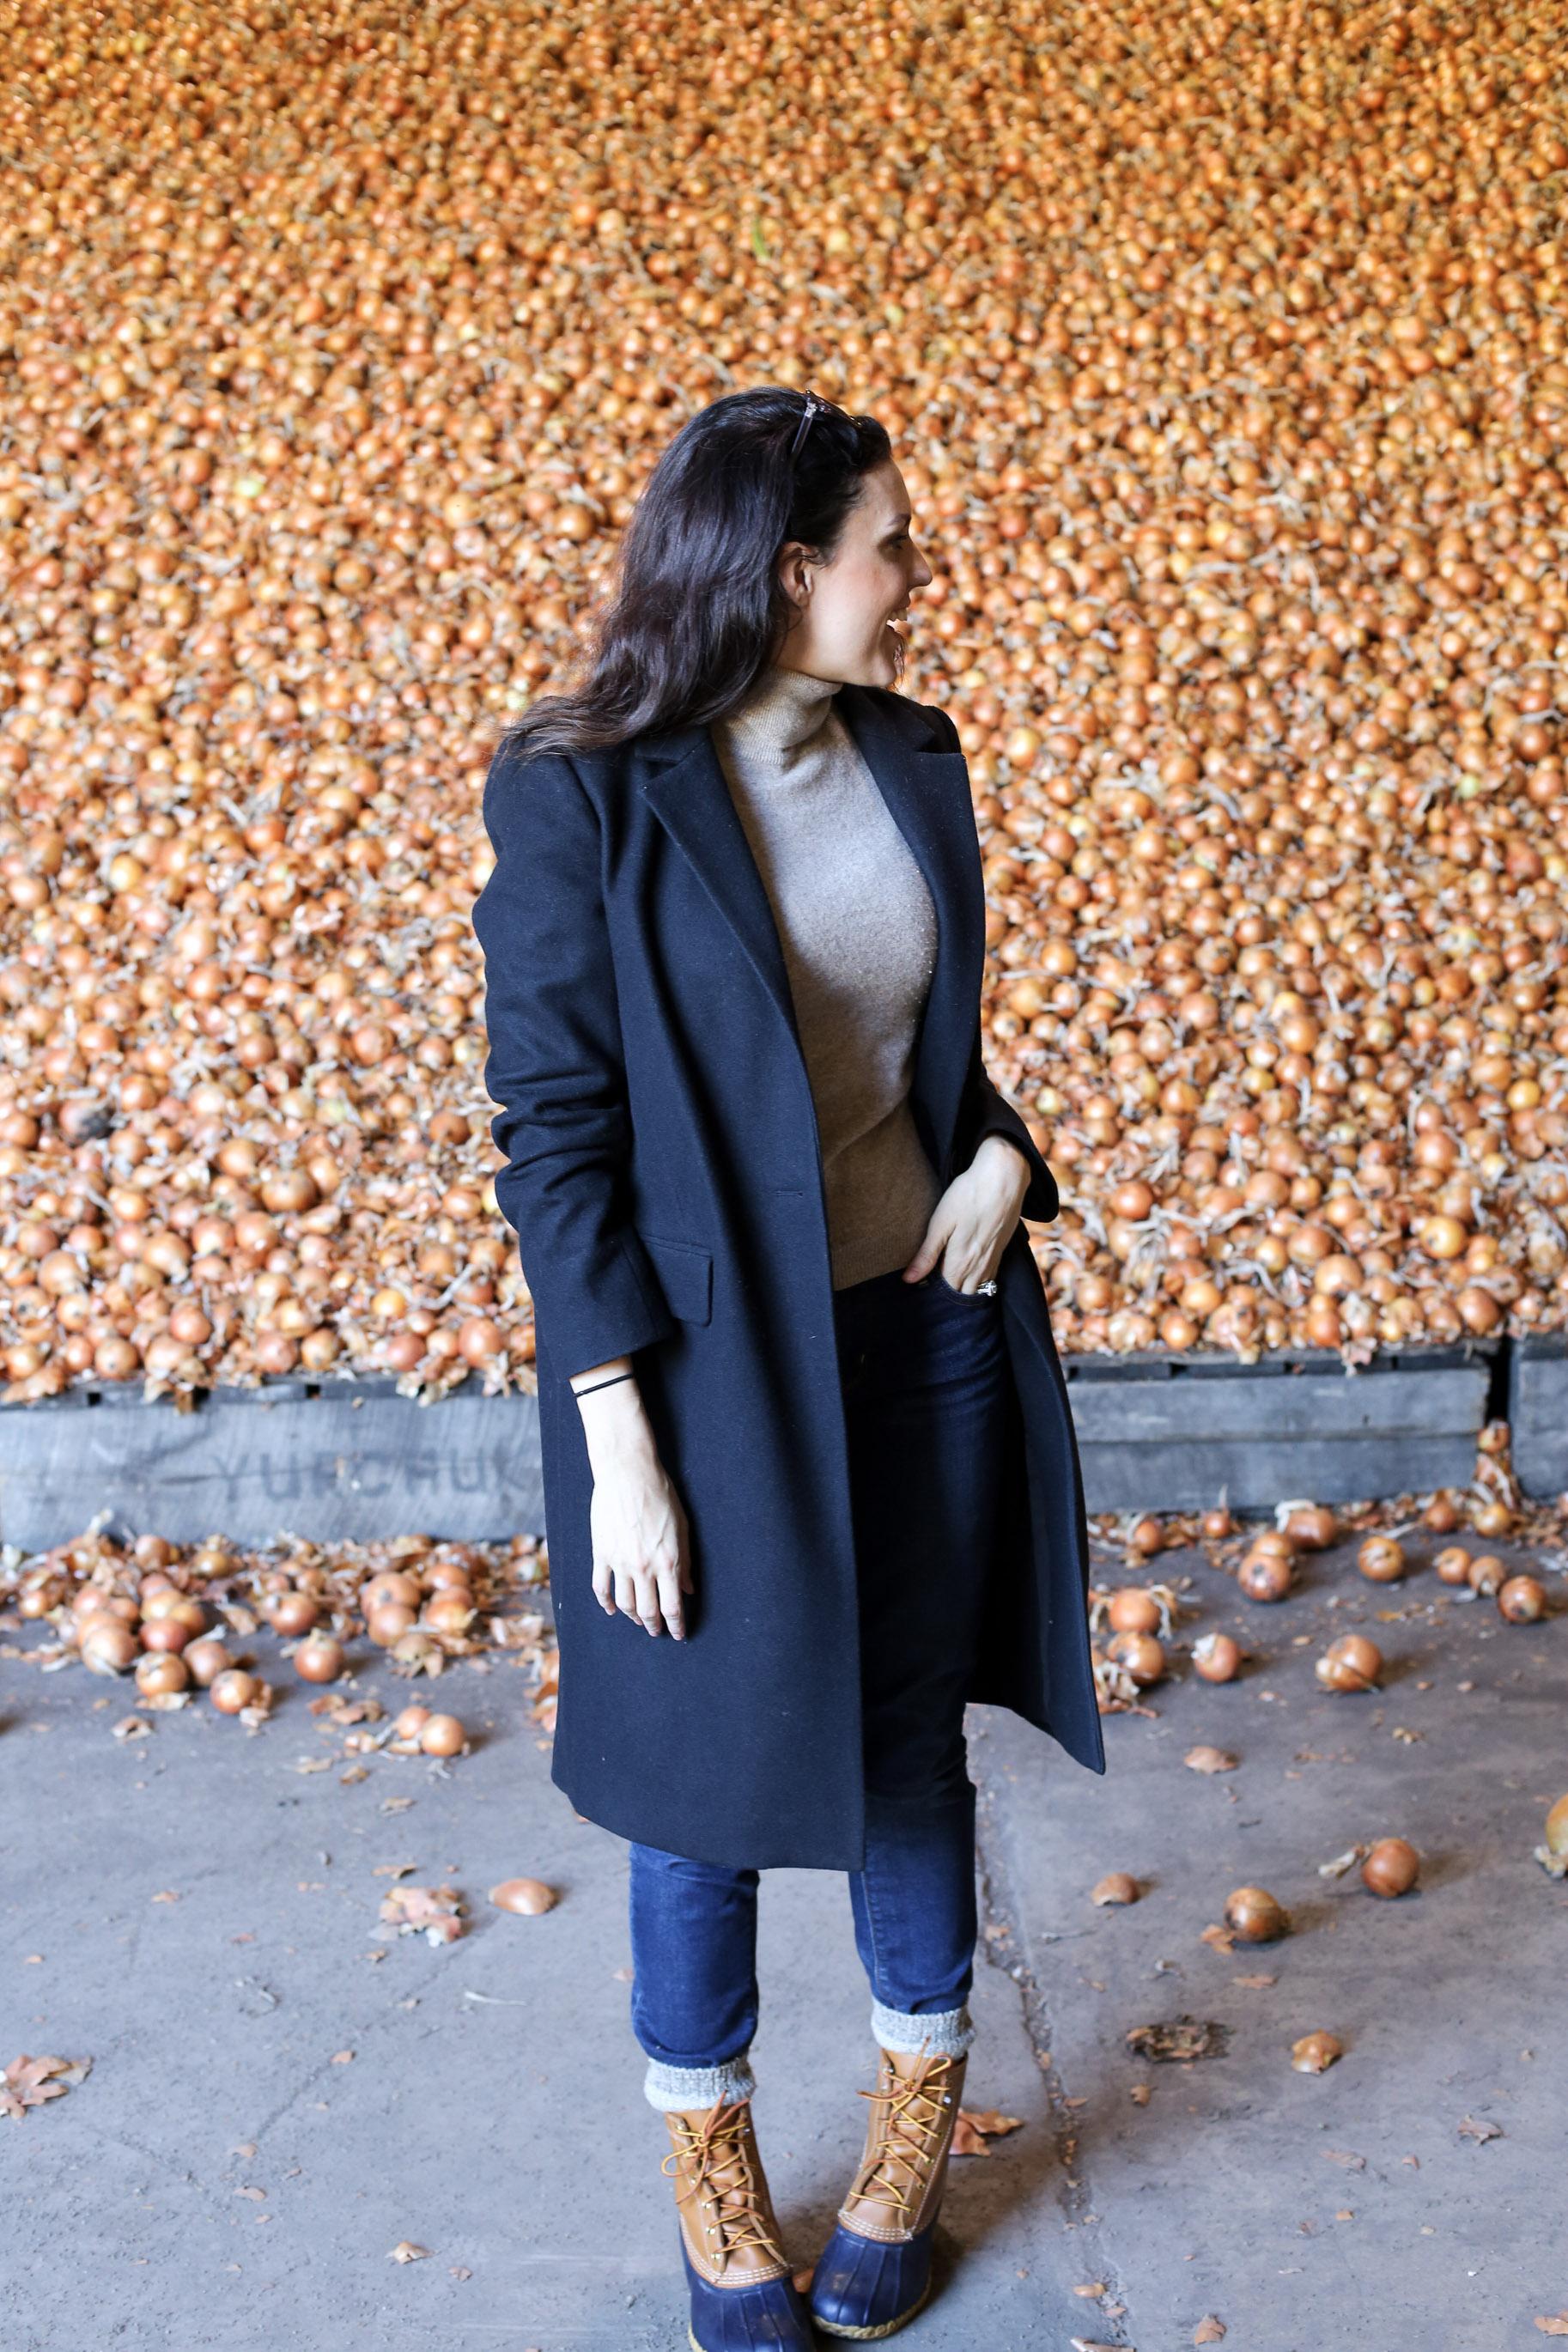 Minkus-Family-Onion-Farm13.jpg